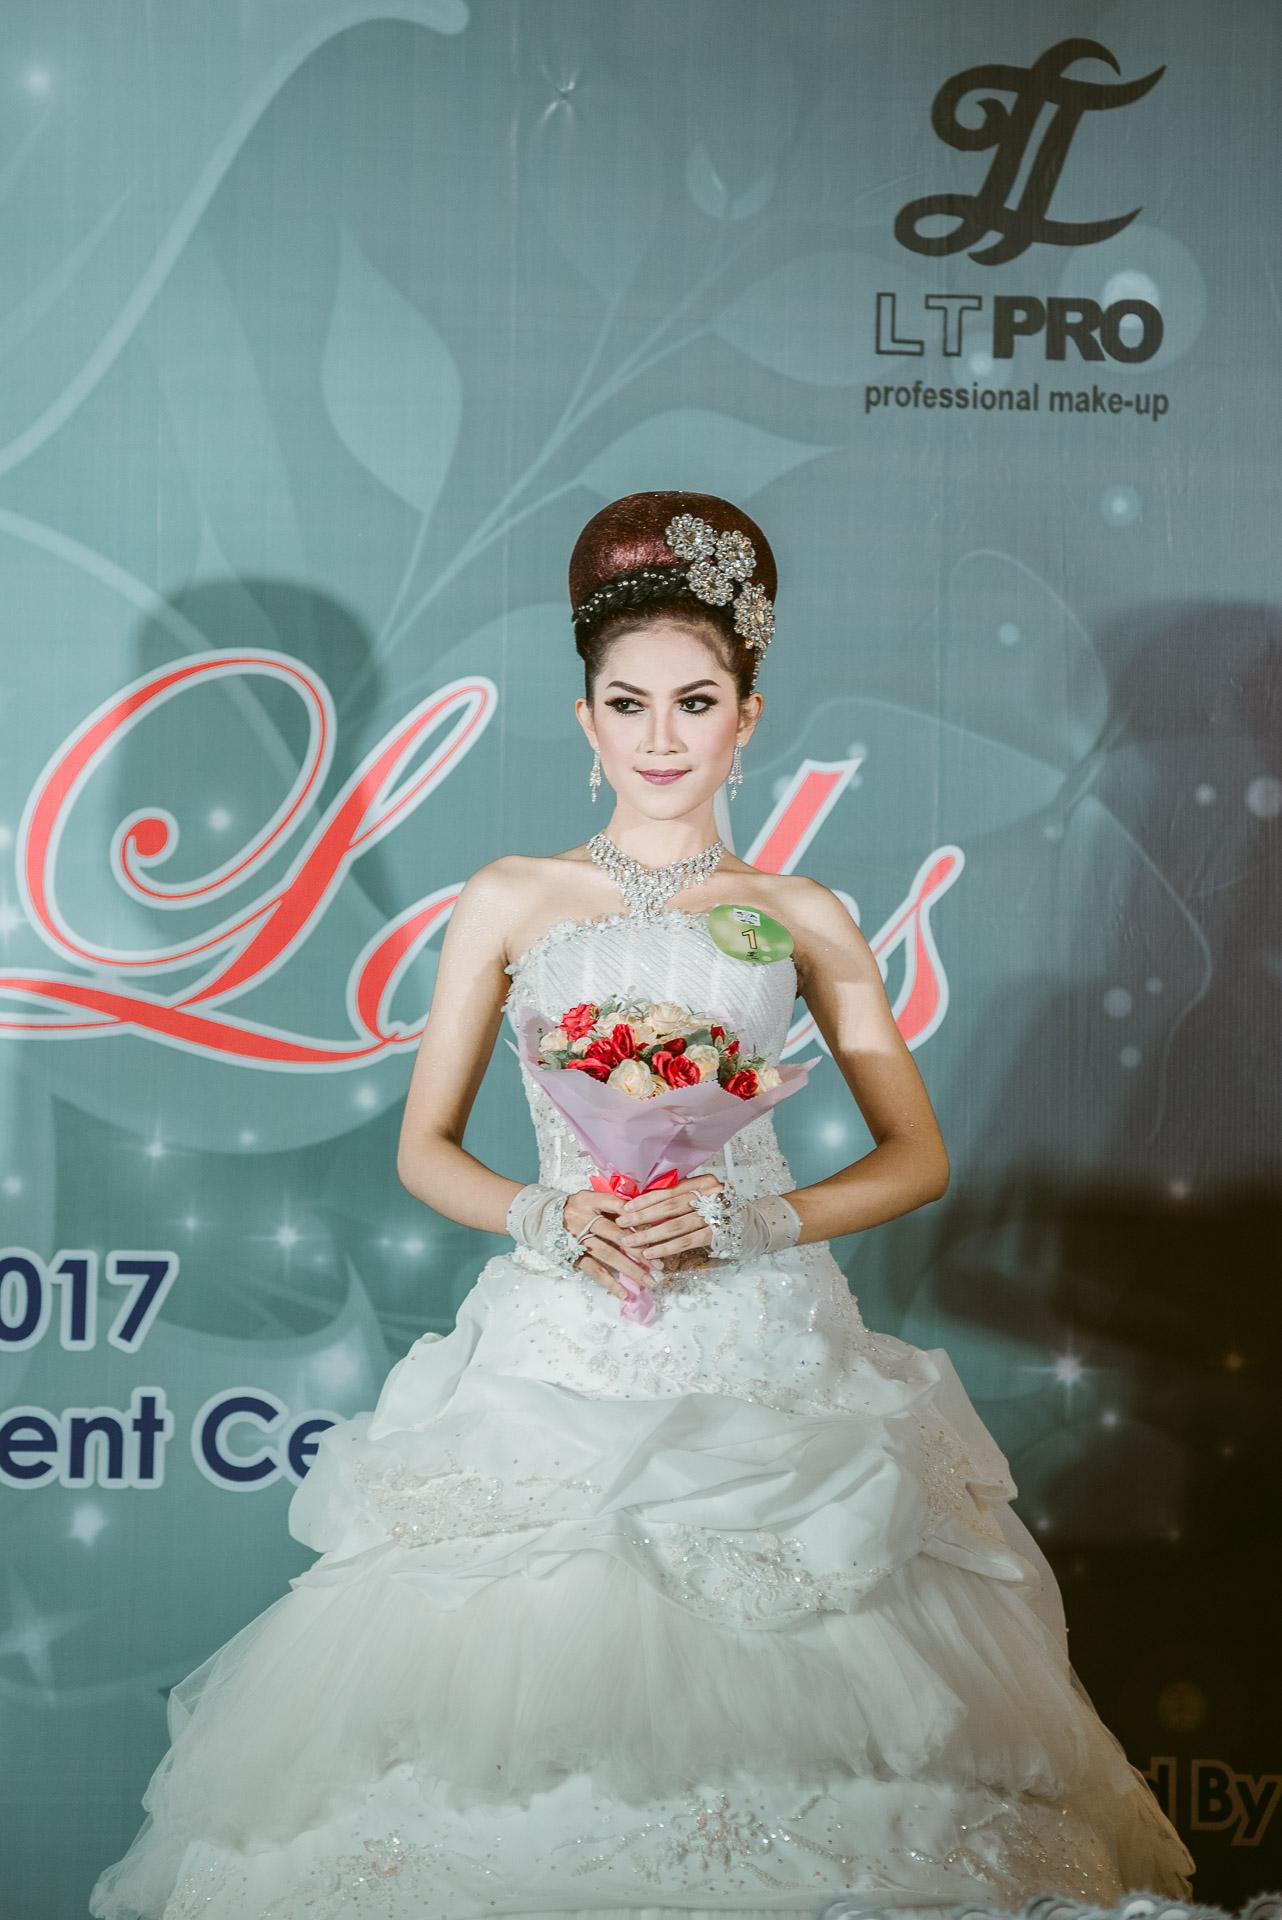 Sewa Wedding Dress Di Bali - bestweddingdresses